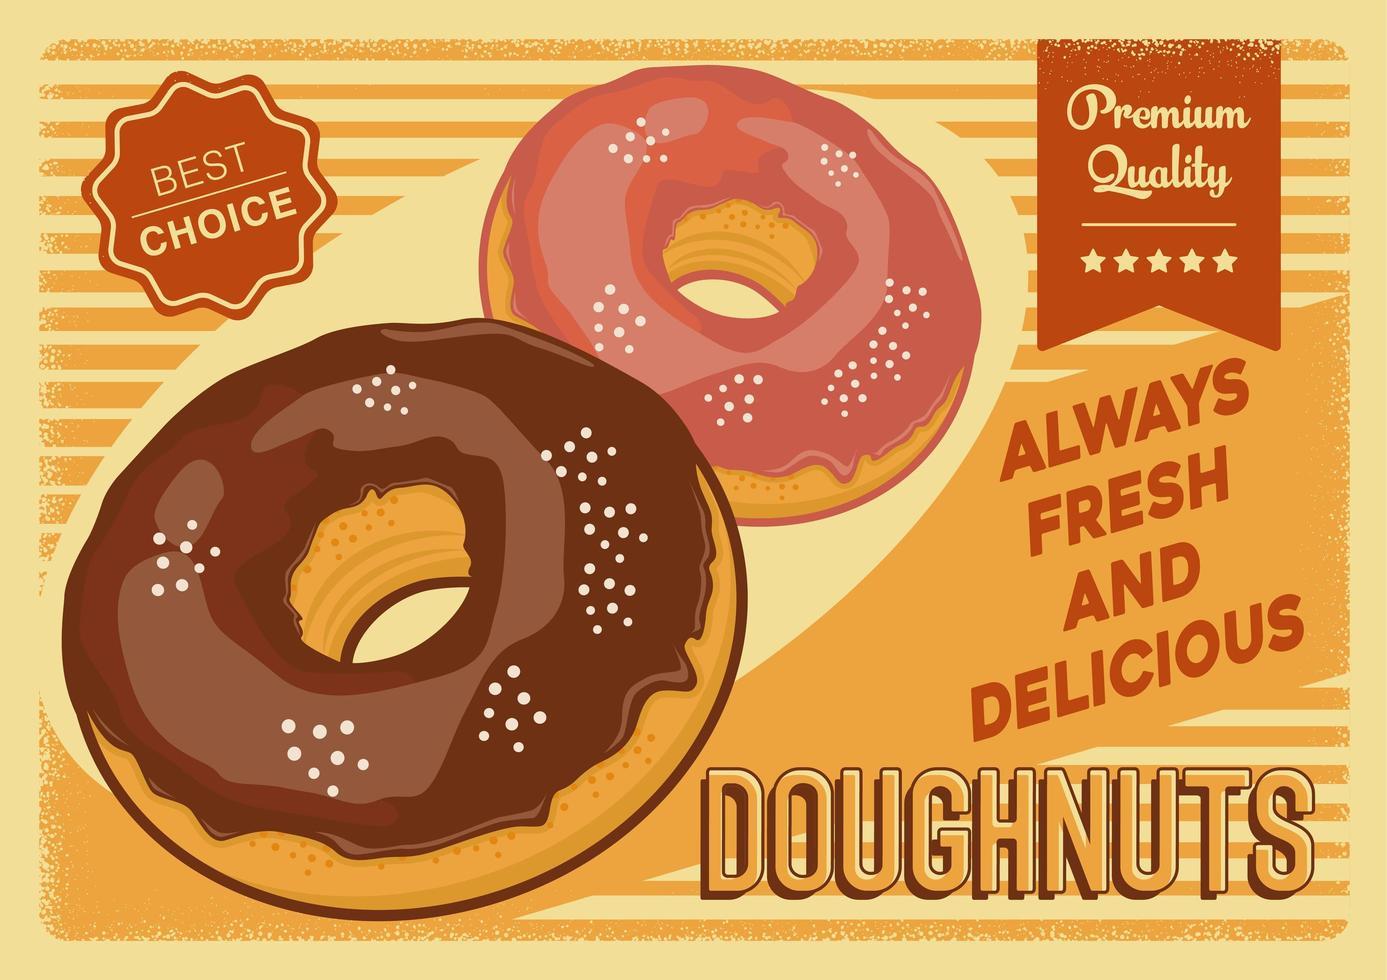 premiumkvalitet donuts skylt affisch vektor